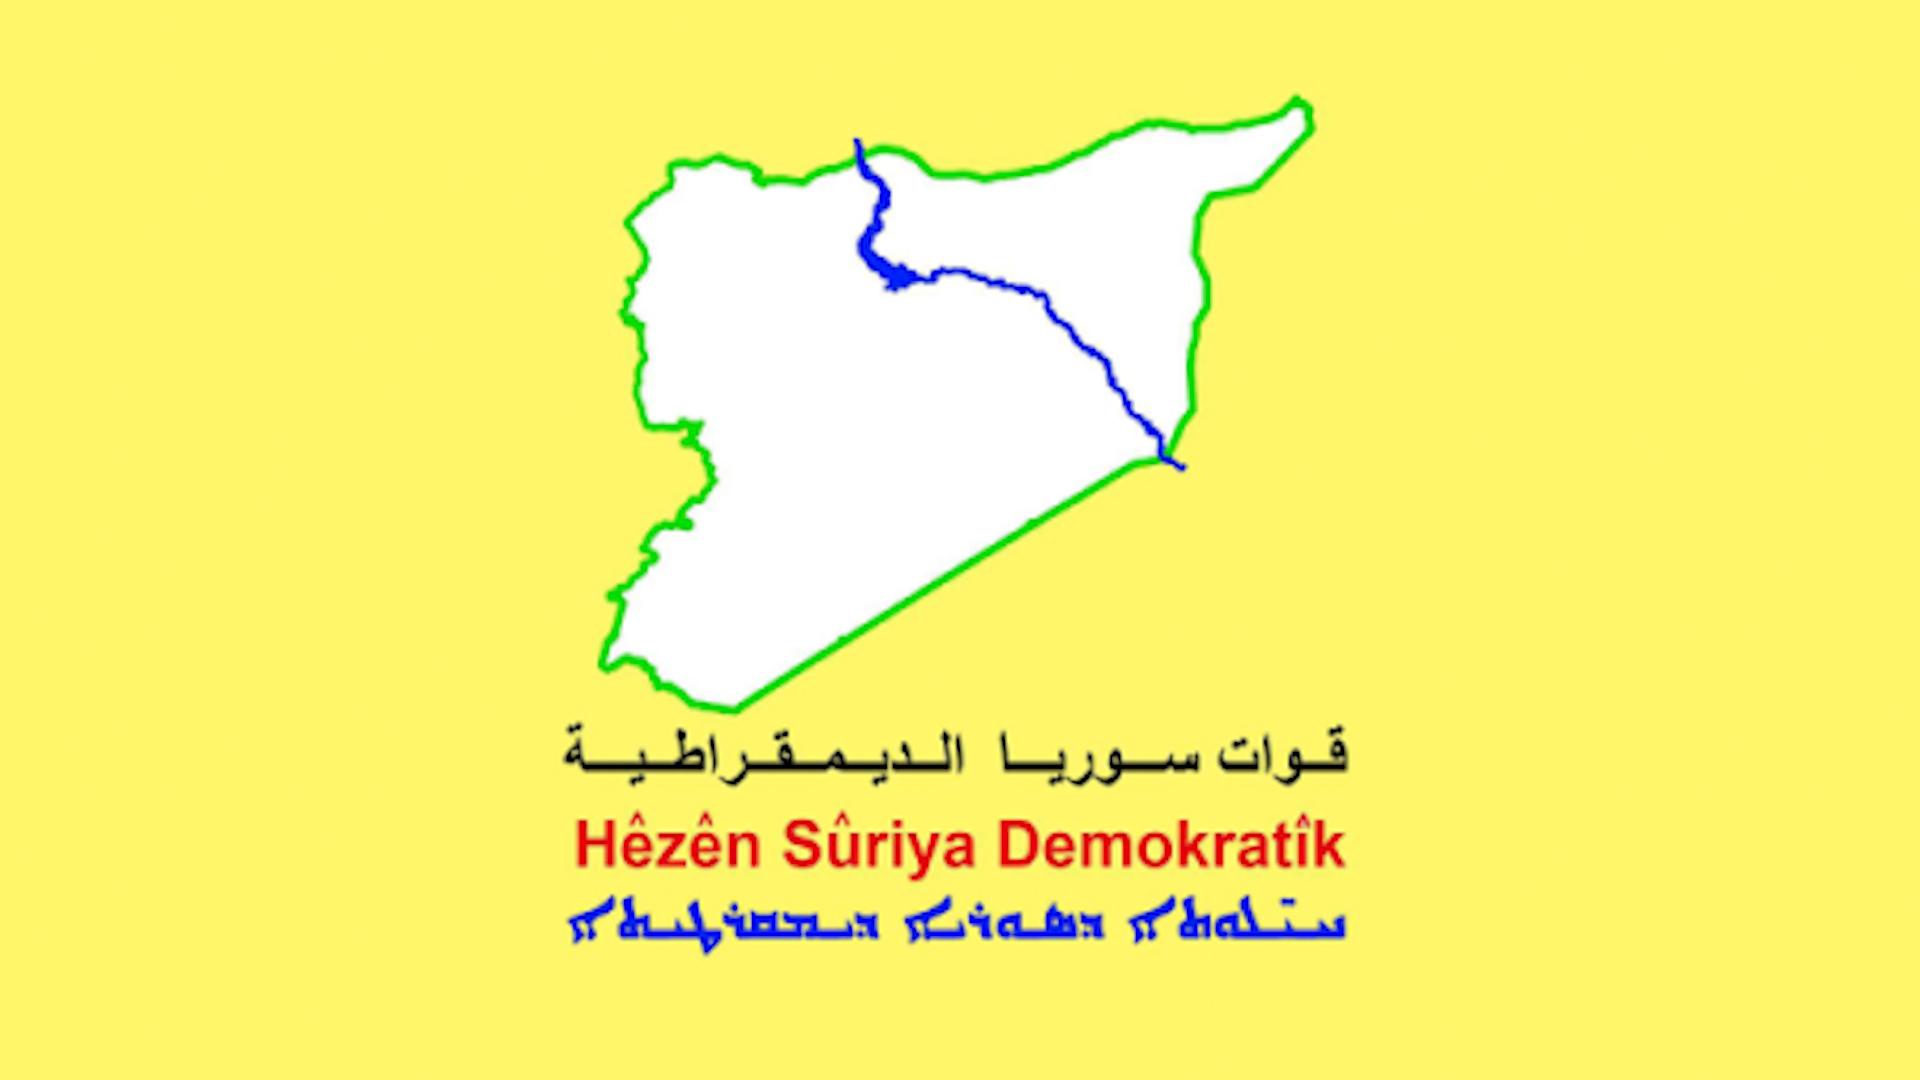 Photo of تشكيل لجنة لتقصي الحقائق بقضية المفقودين في شمال وشرق سوريا